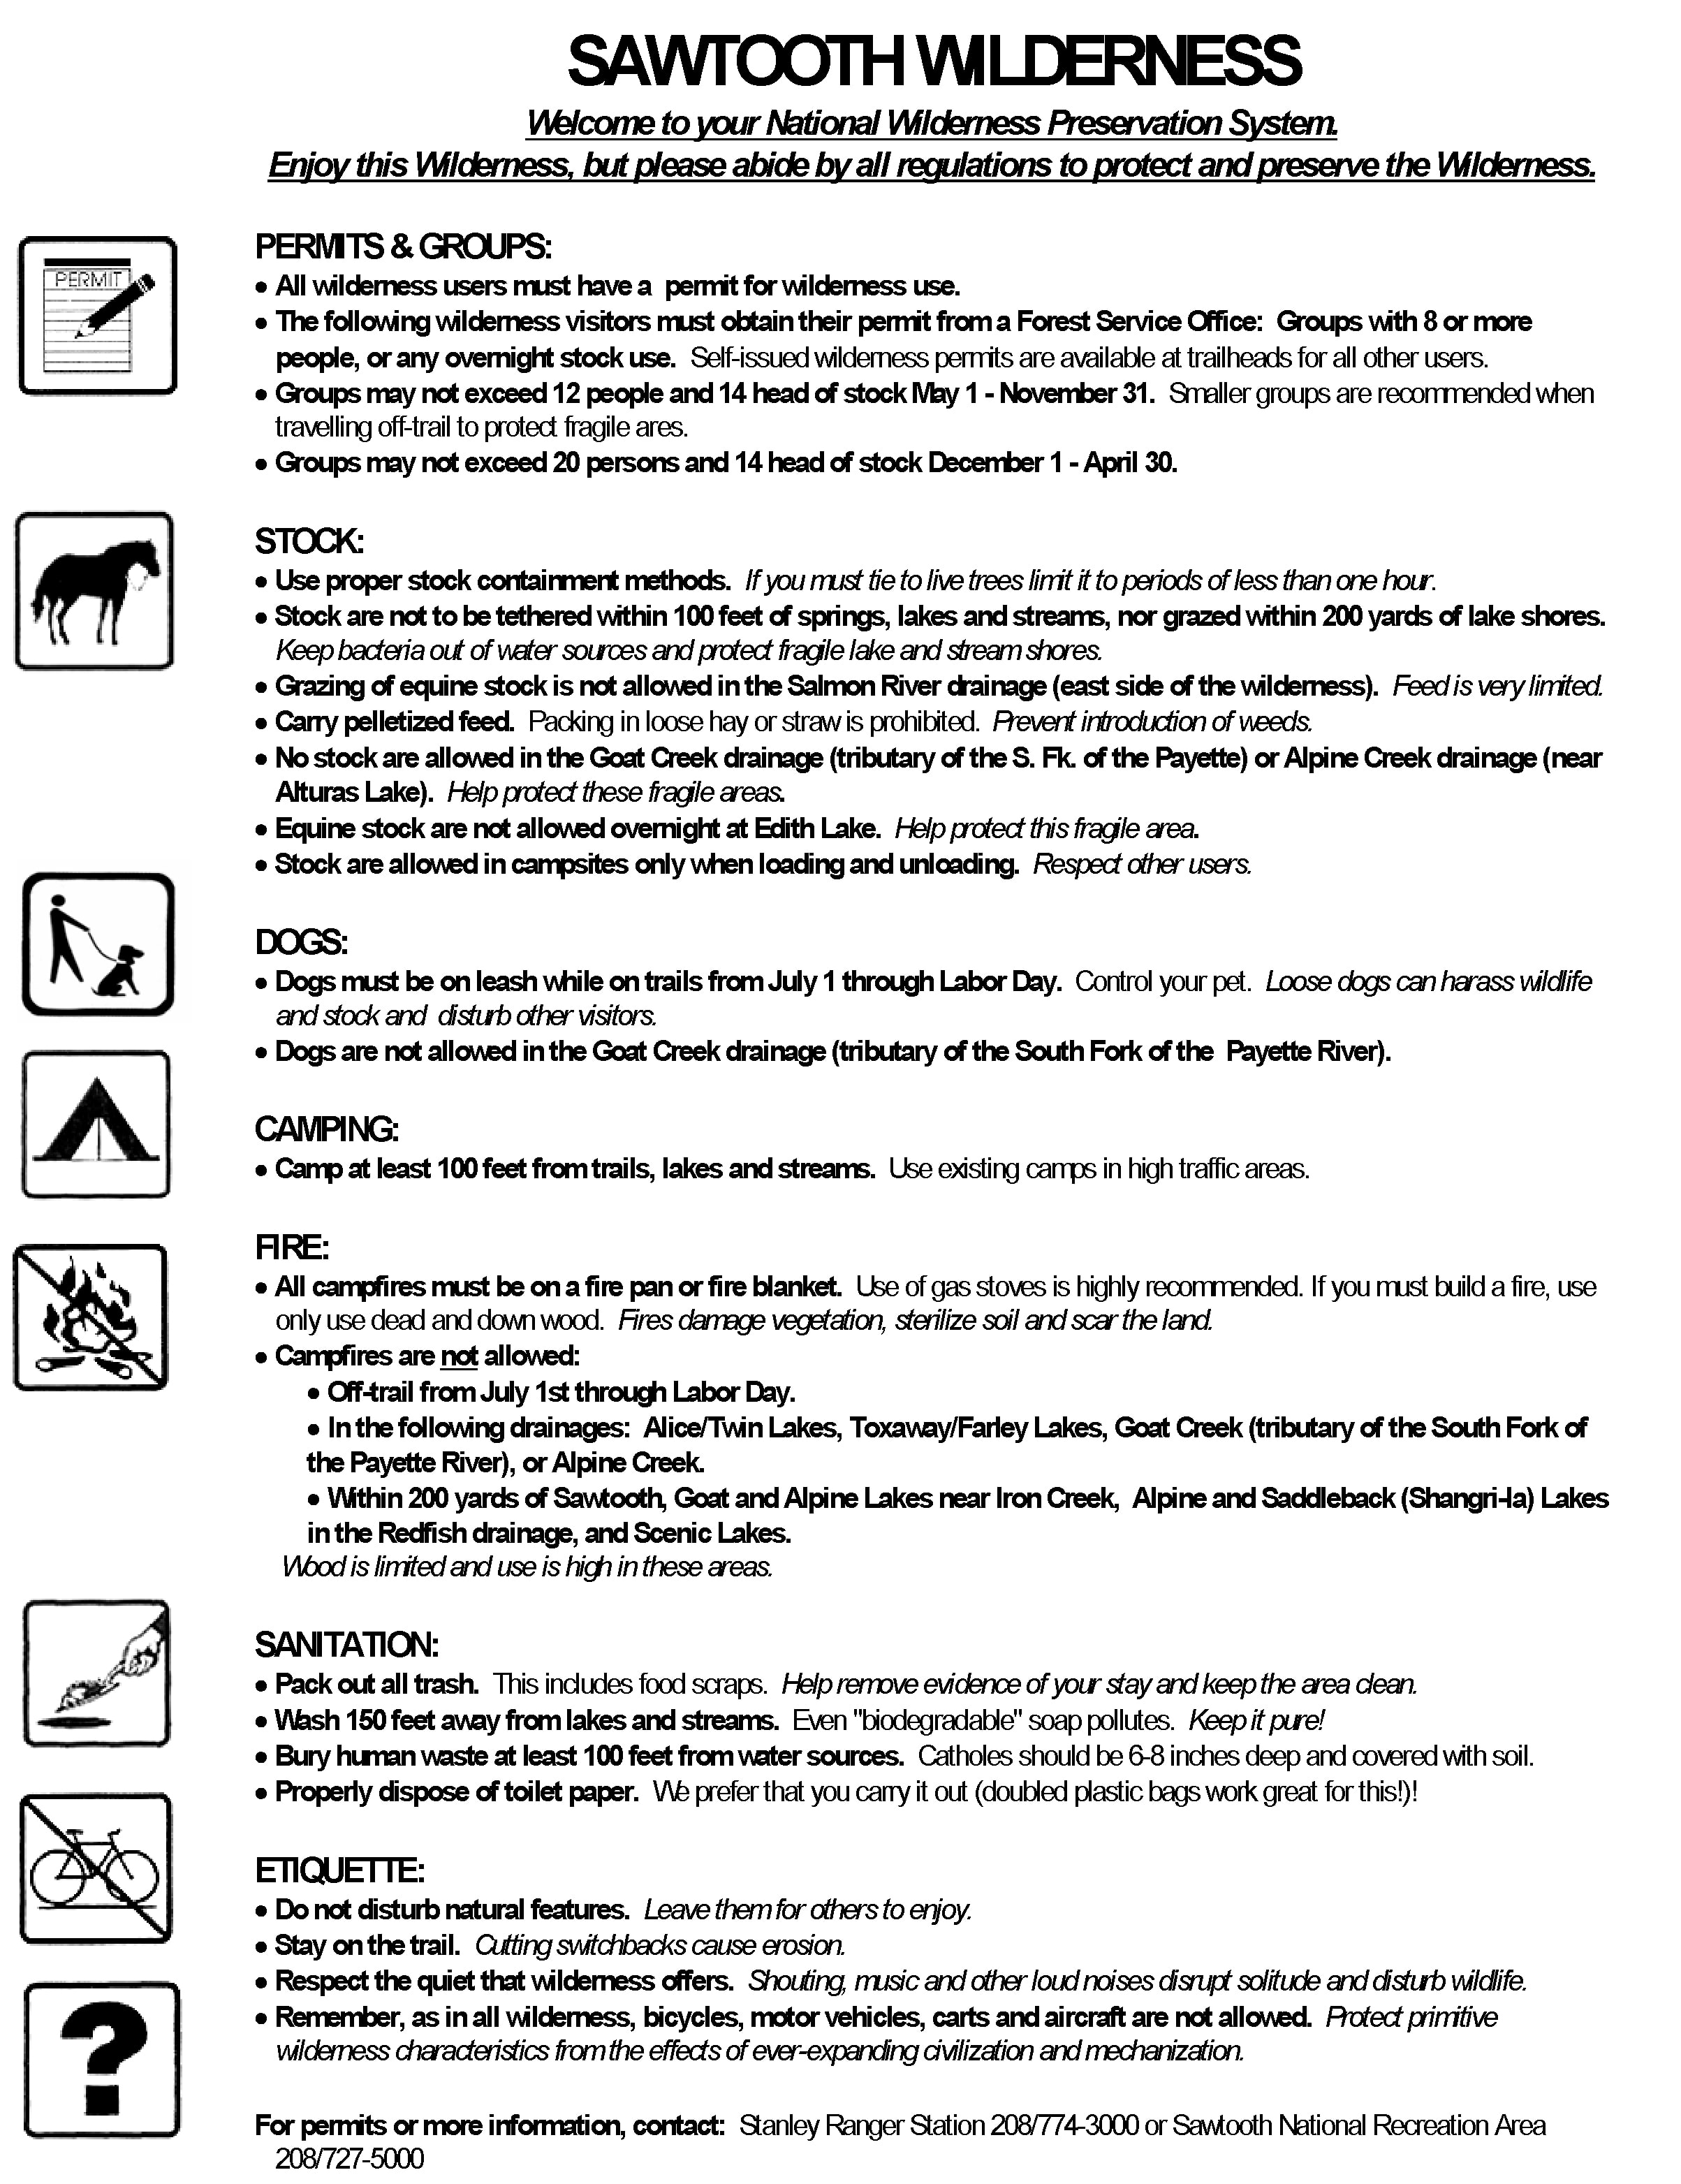 Sawtooth Wilderness Regulations